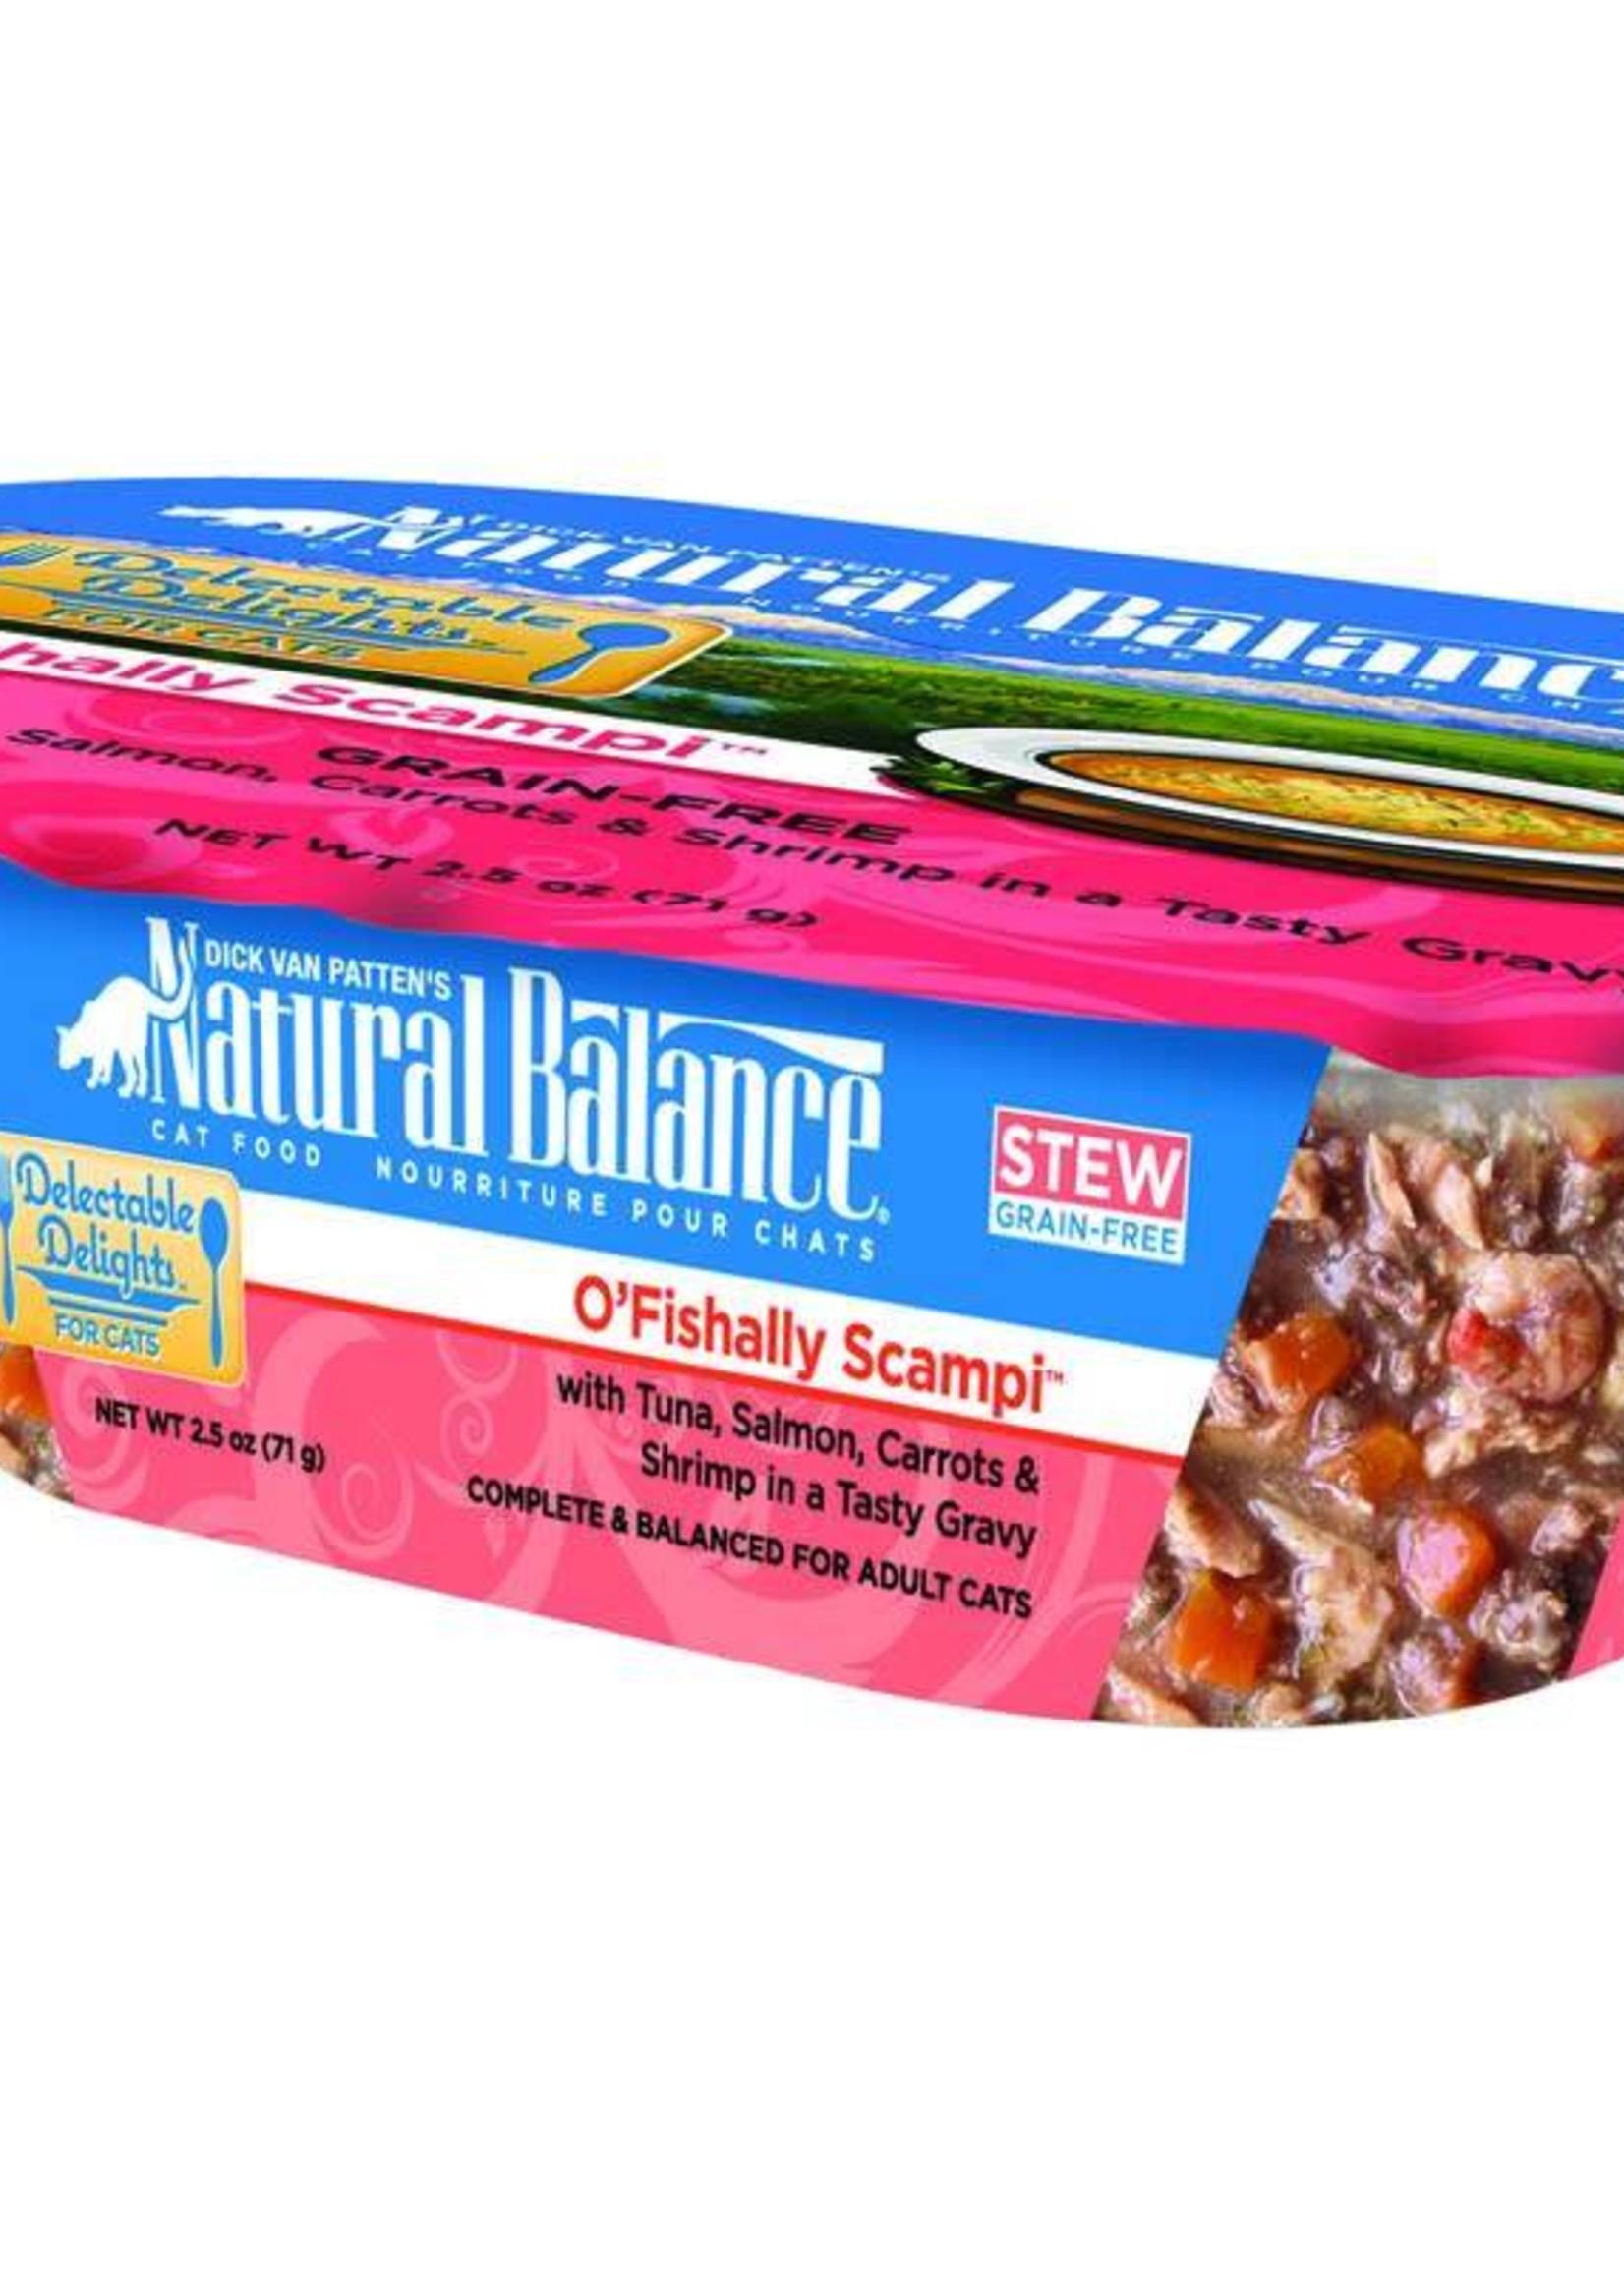 Natural Balance Pet Foods, Inc. Natural Balance Delectable Delights O'Fishally Scampi Stew Fel 2.5oz